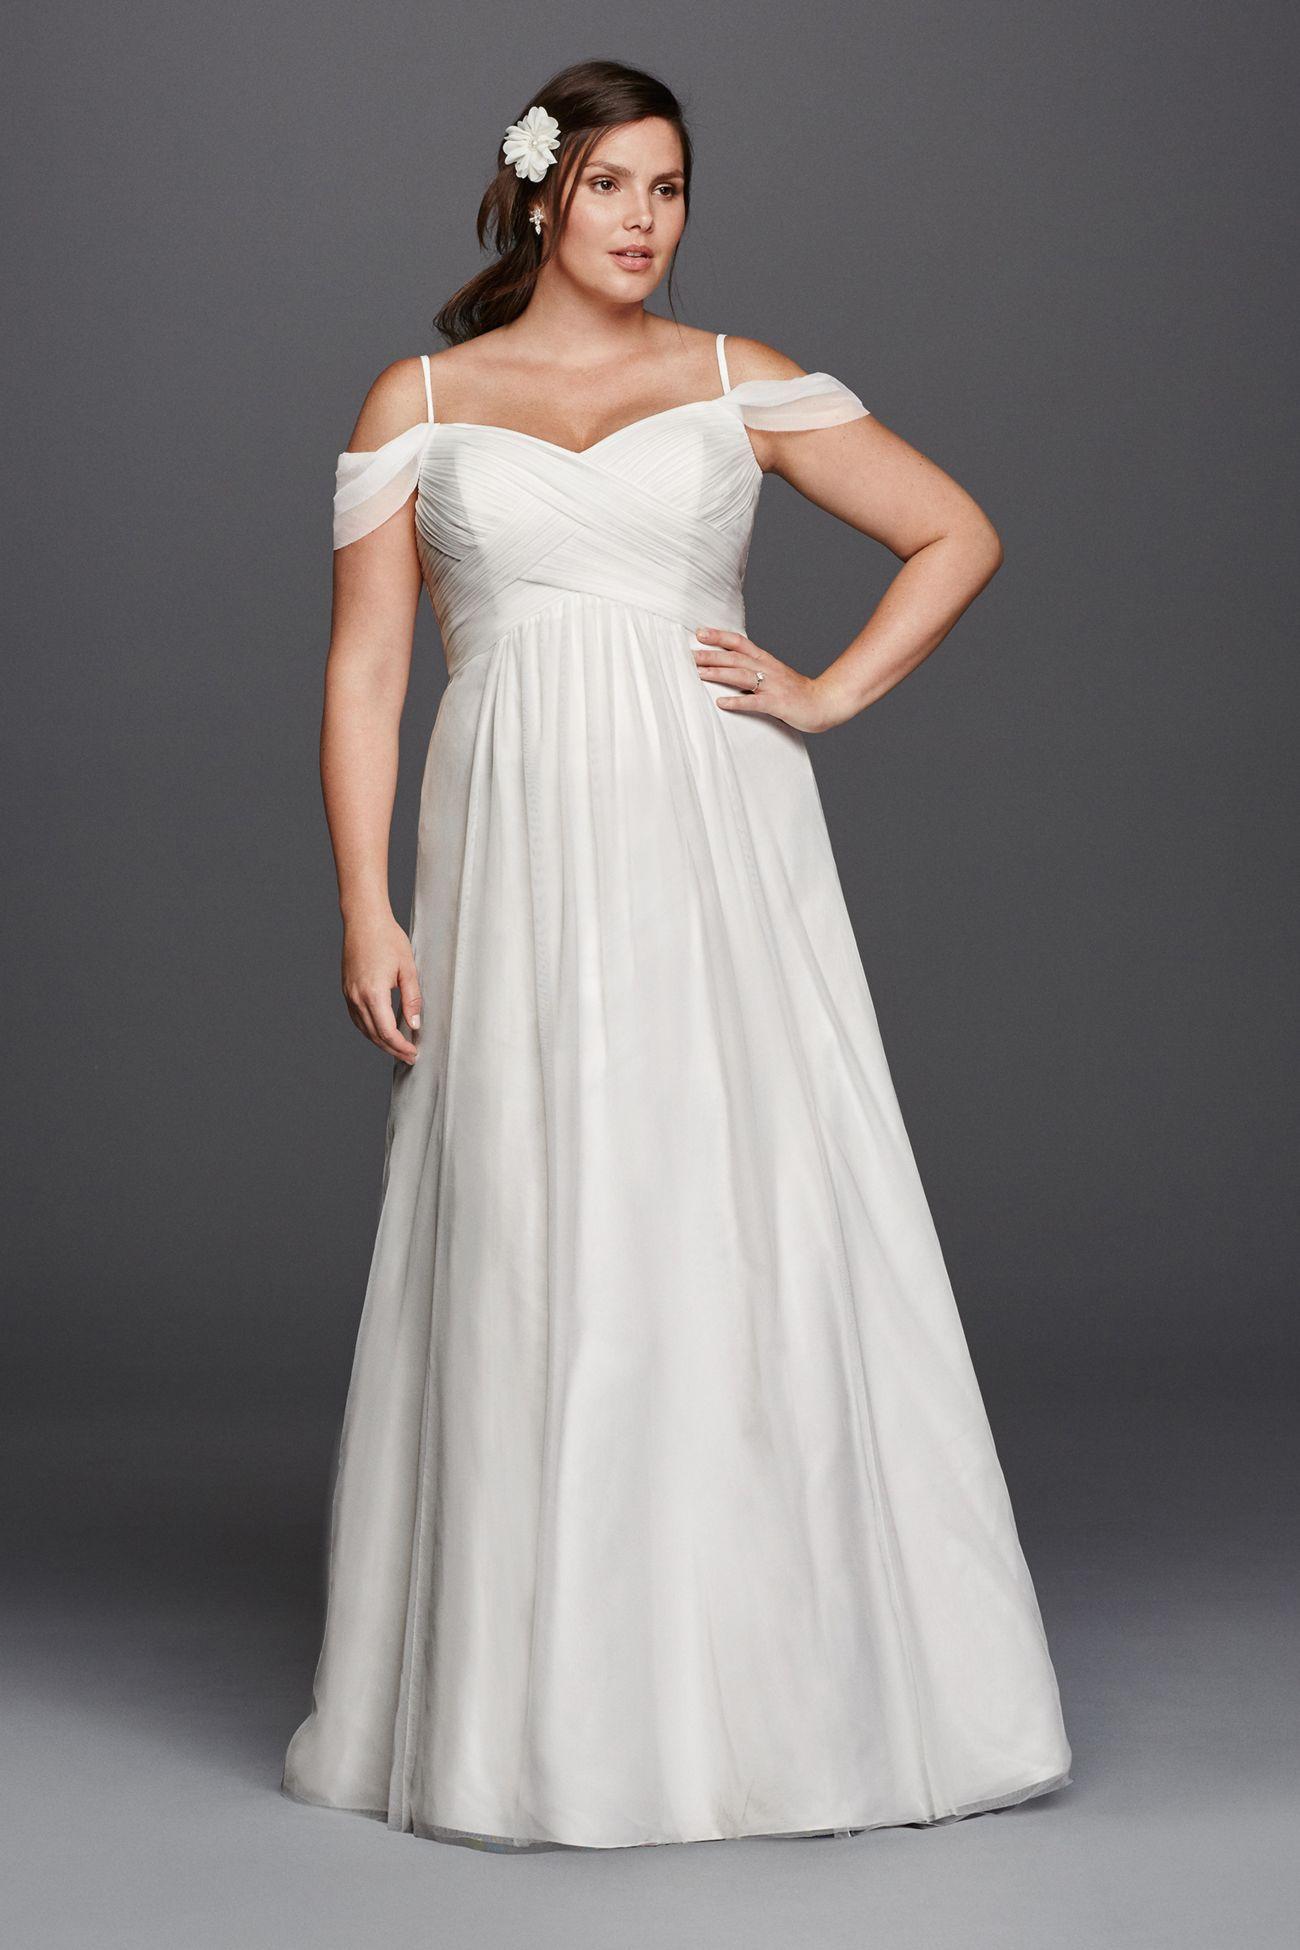 Aline Plus Size Wedding Dress with Swag Sleeves Wedding